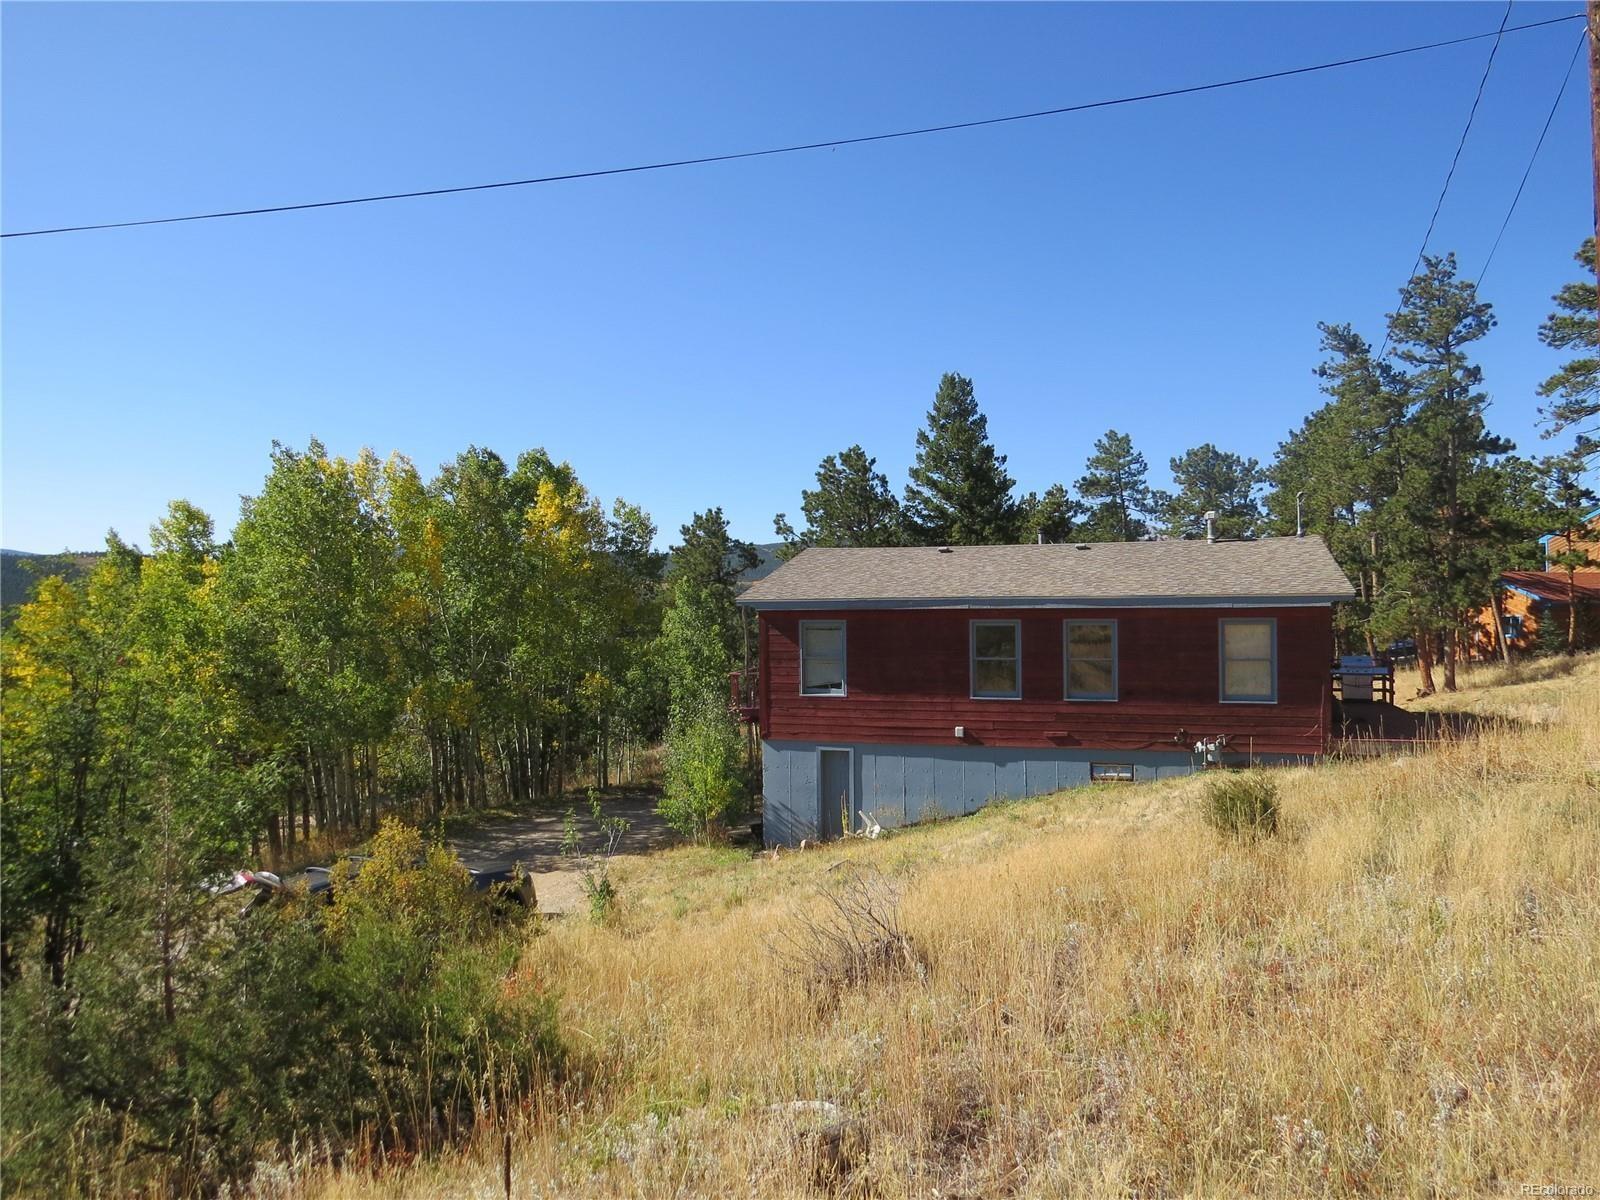 MLS# 9251839 - 8 - 50 Navajo Trail, Nederland, CO 80466